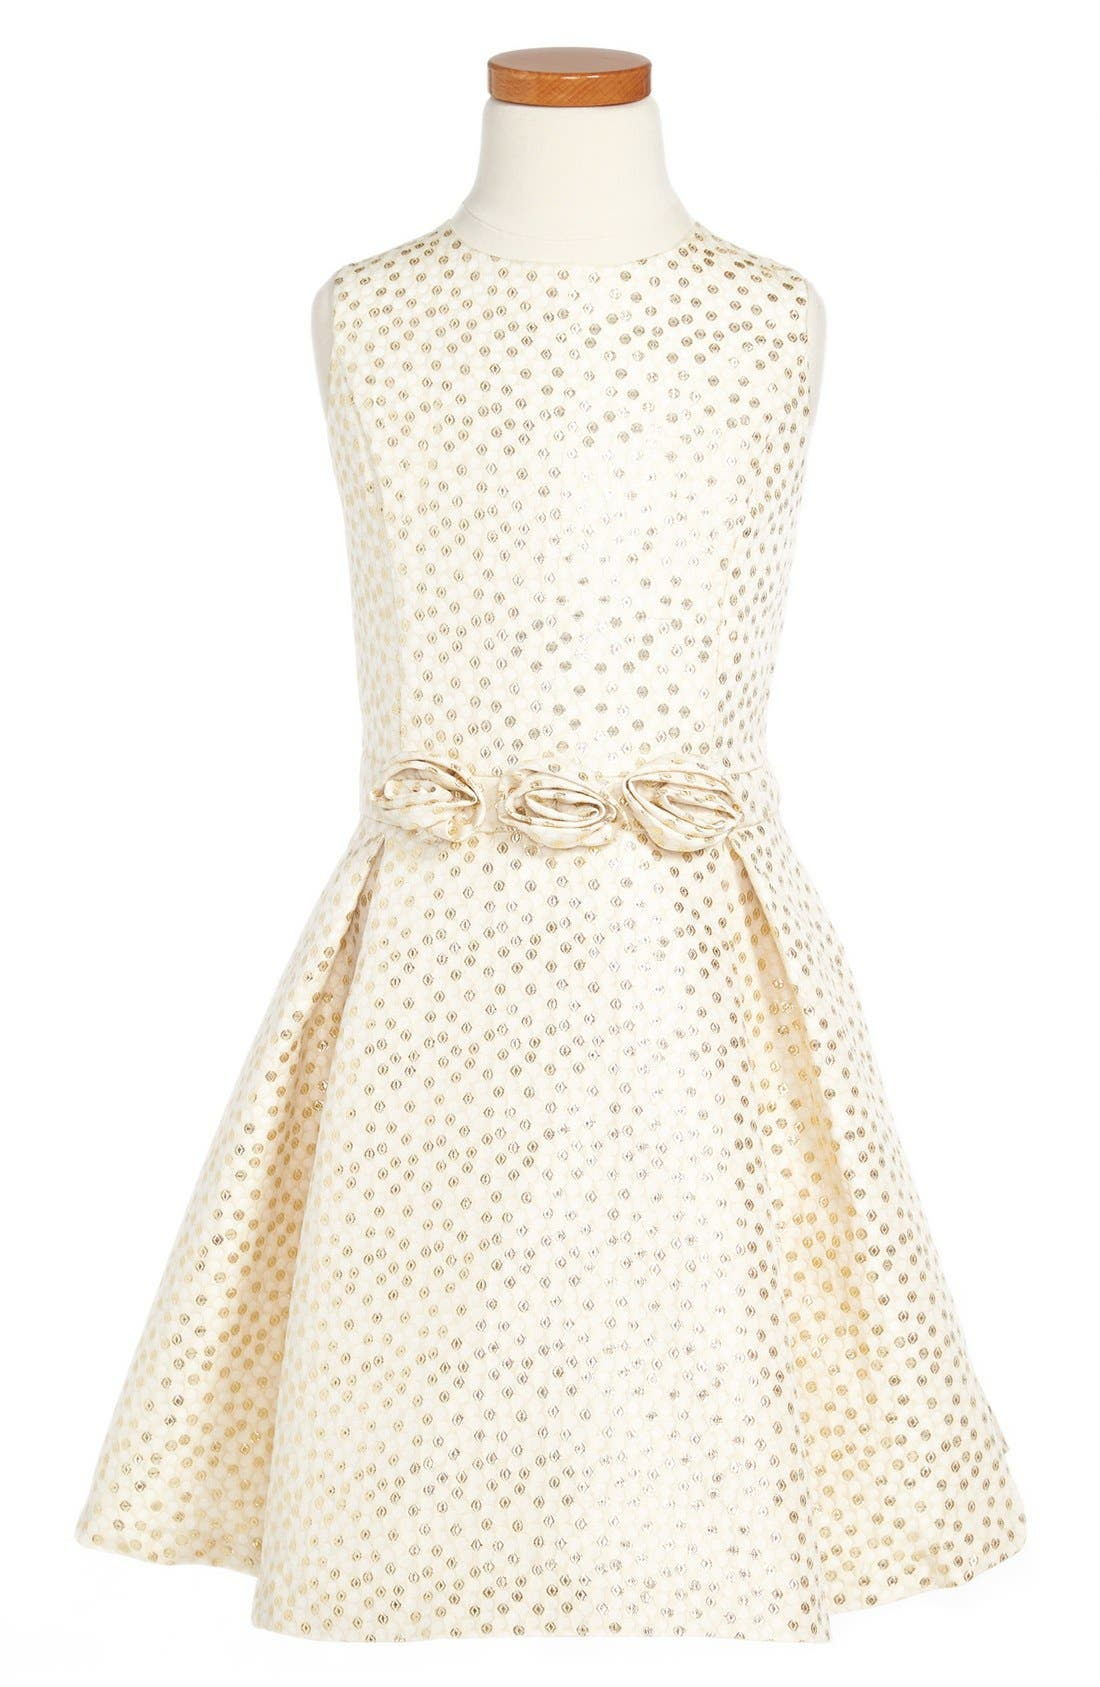 Alternate Image 1 Selected - ABS by Allen Schwartz Sleeveless Box Pleat Dress (Big Girls)